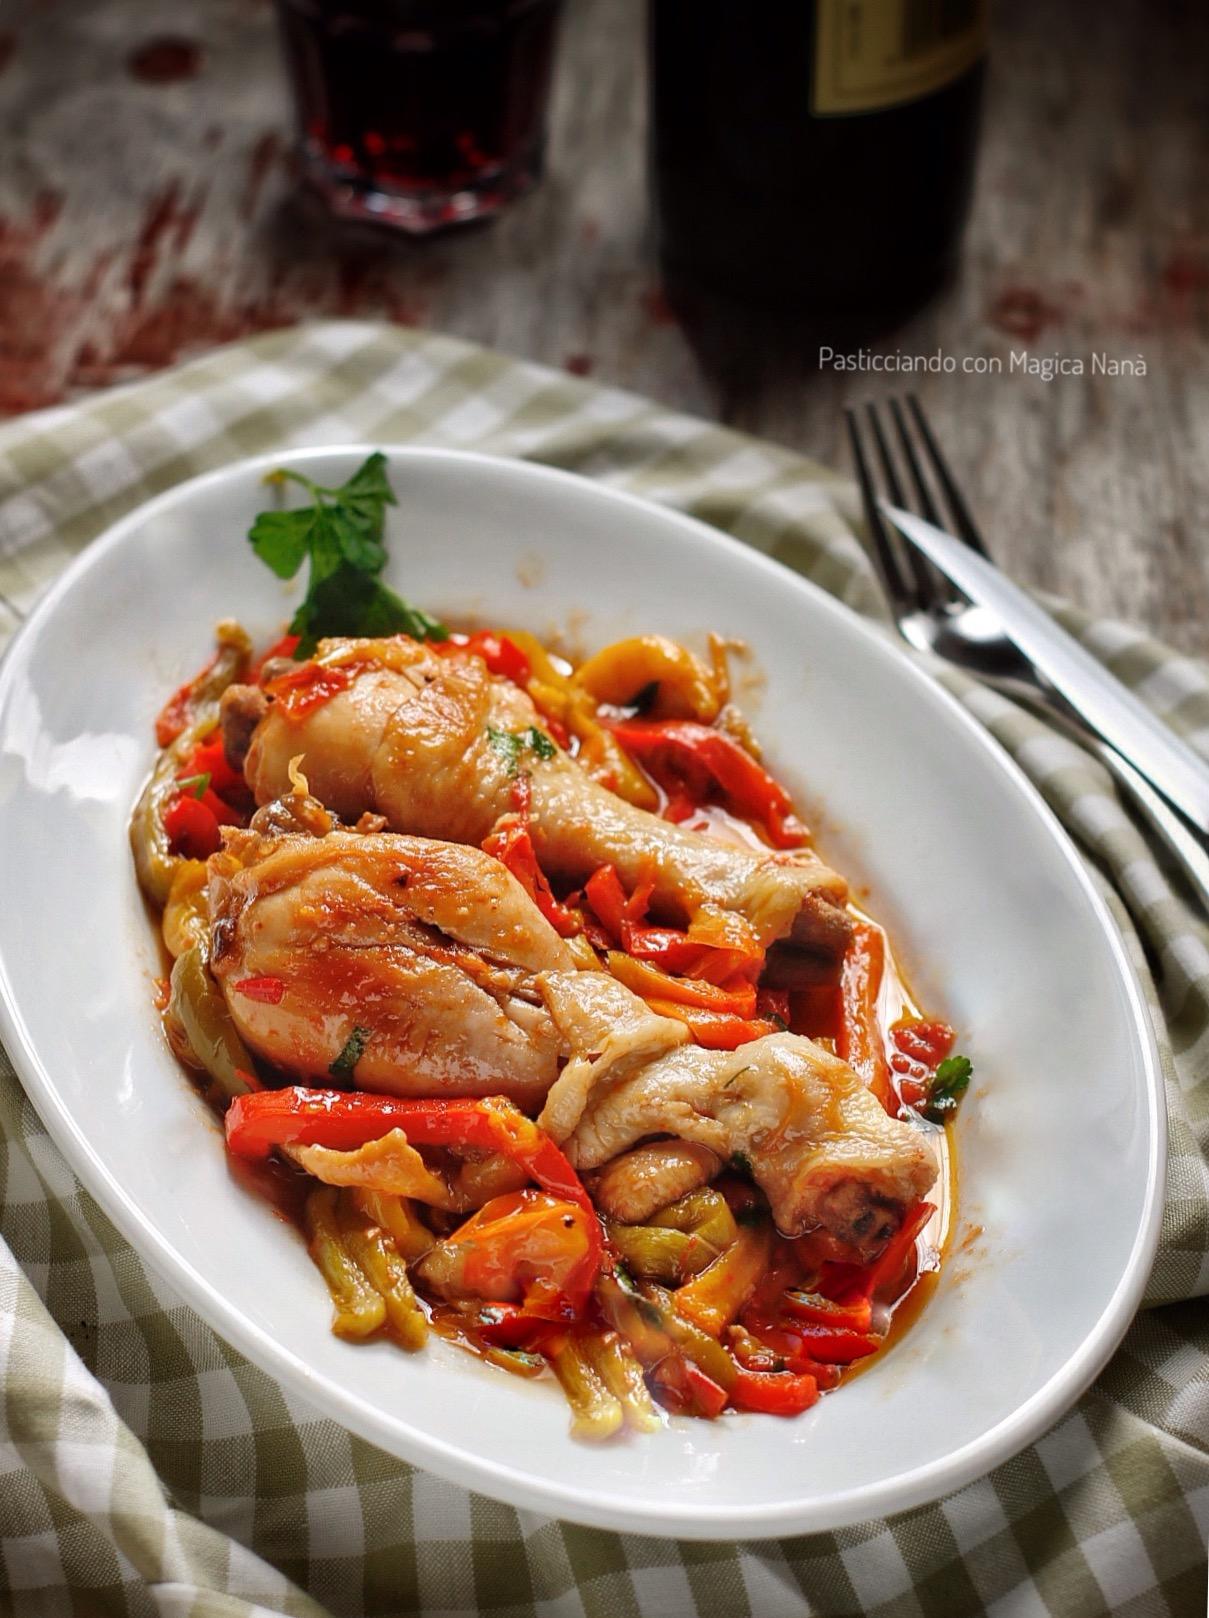 Pollo co peperoni